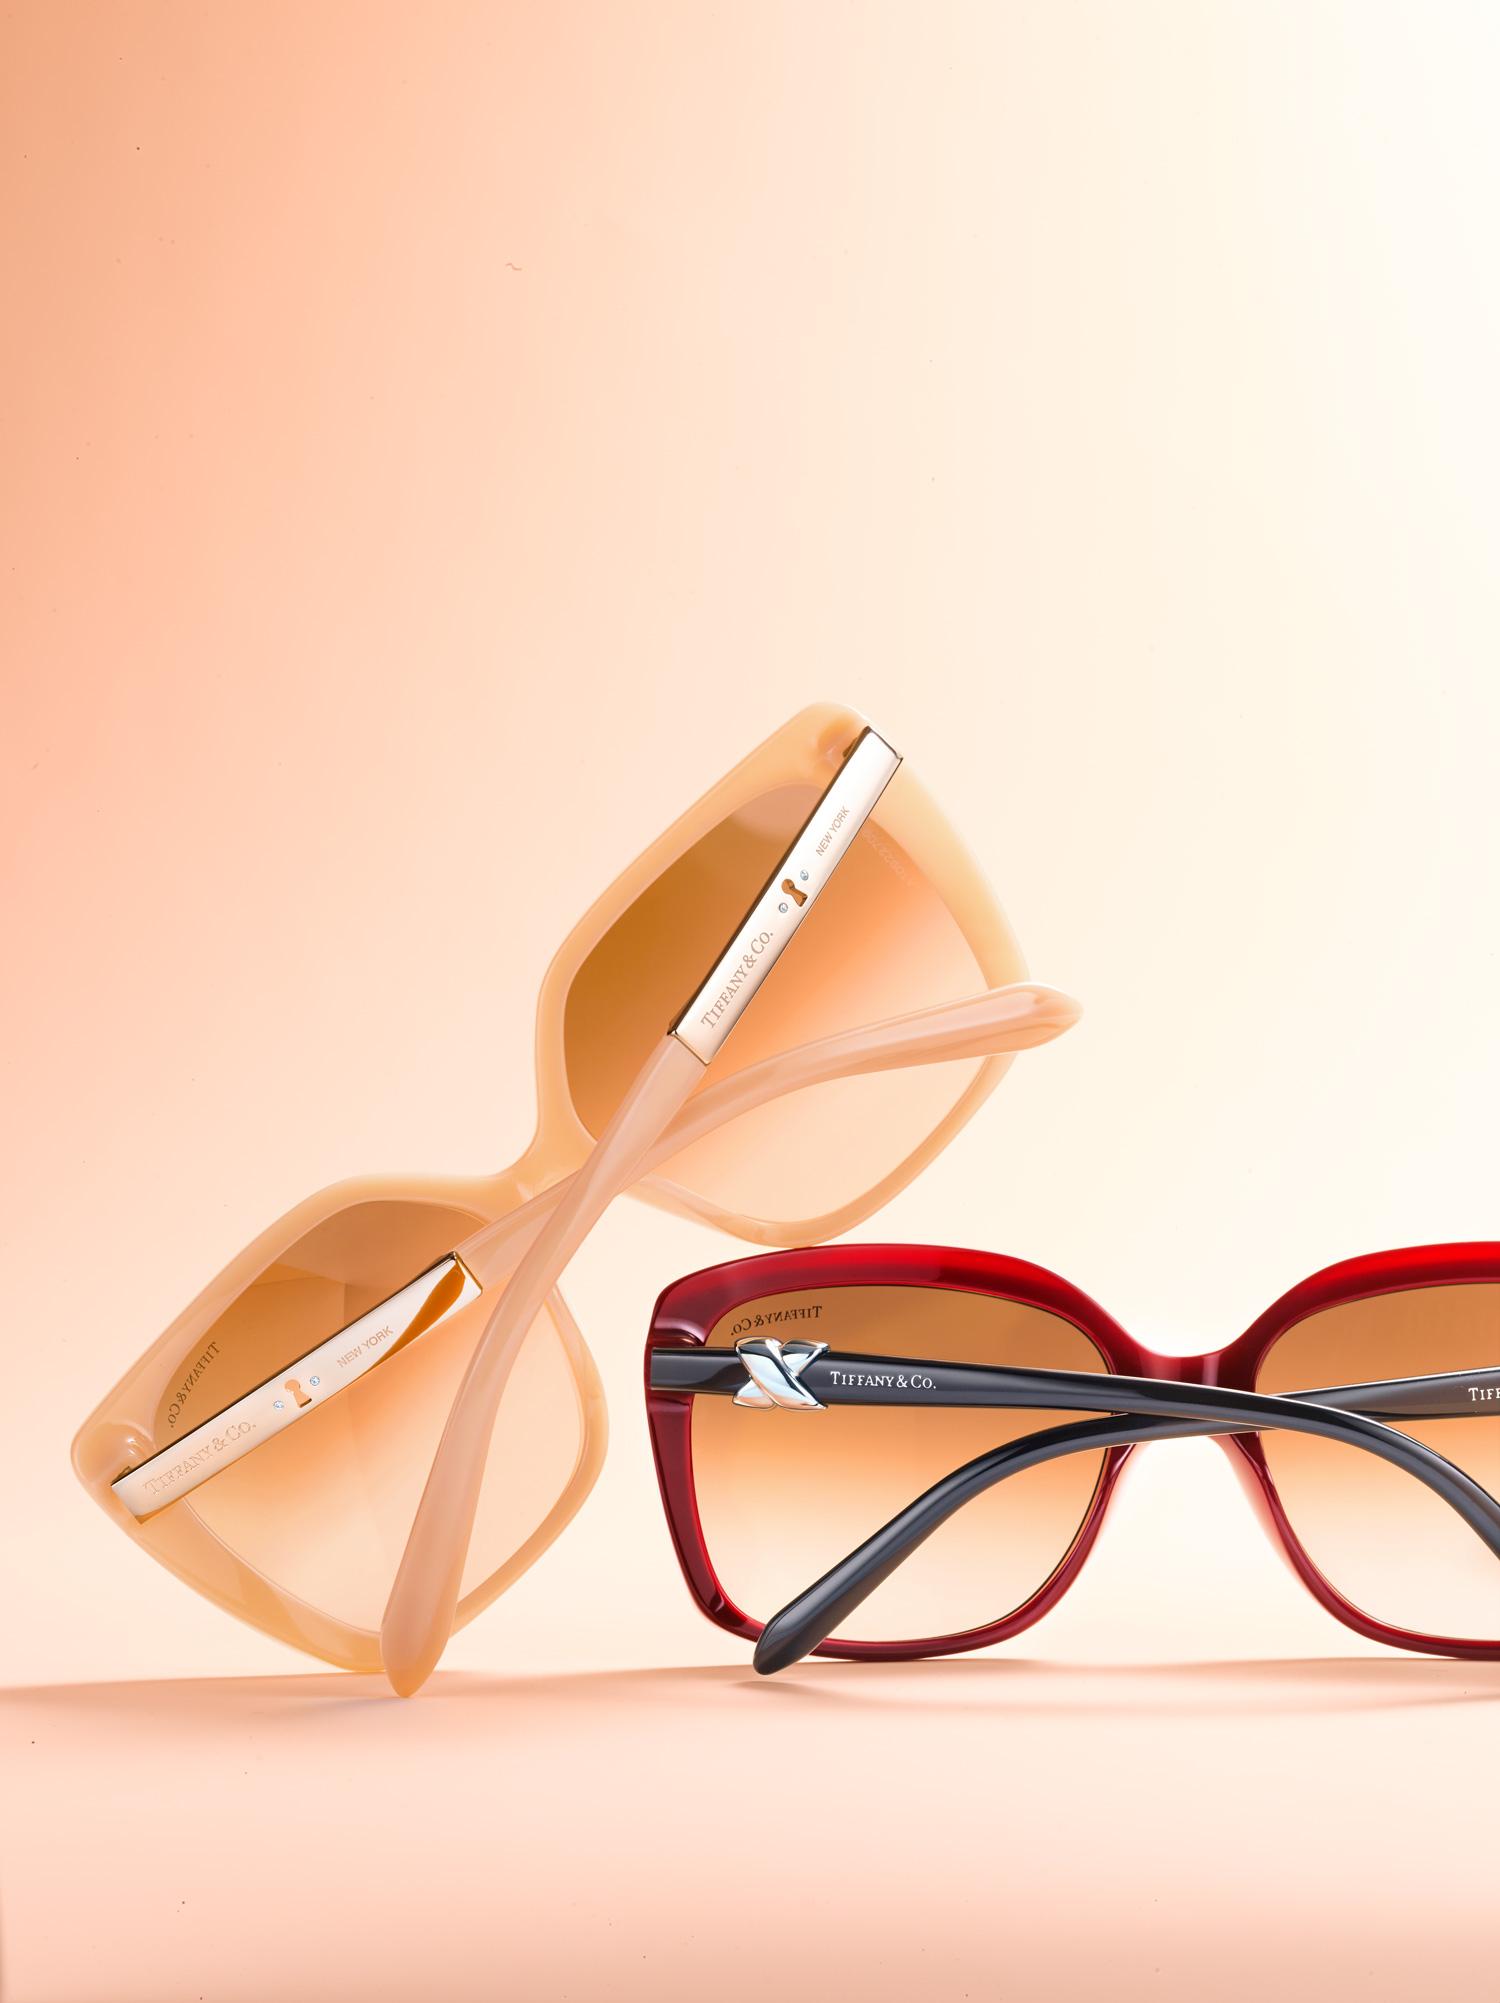 7-11-Sunglasses-email_1_ret_ml.jpg